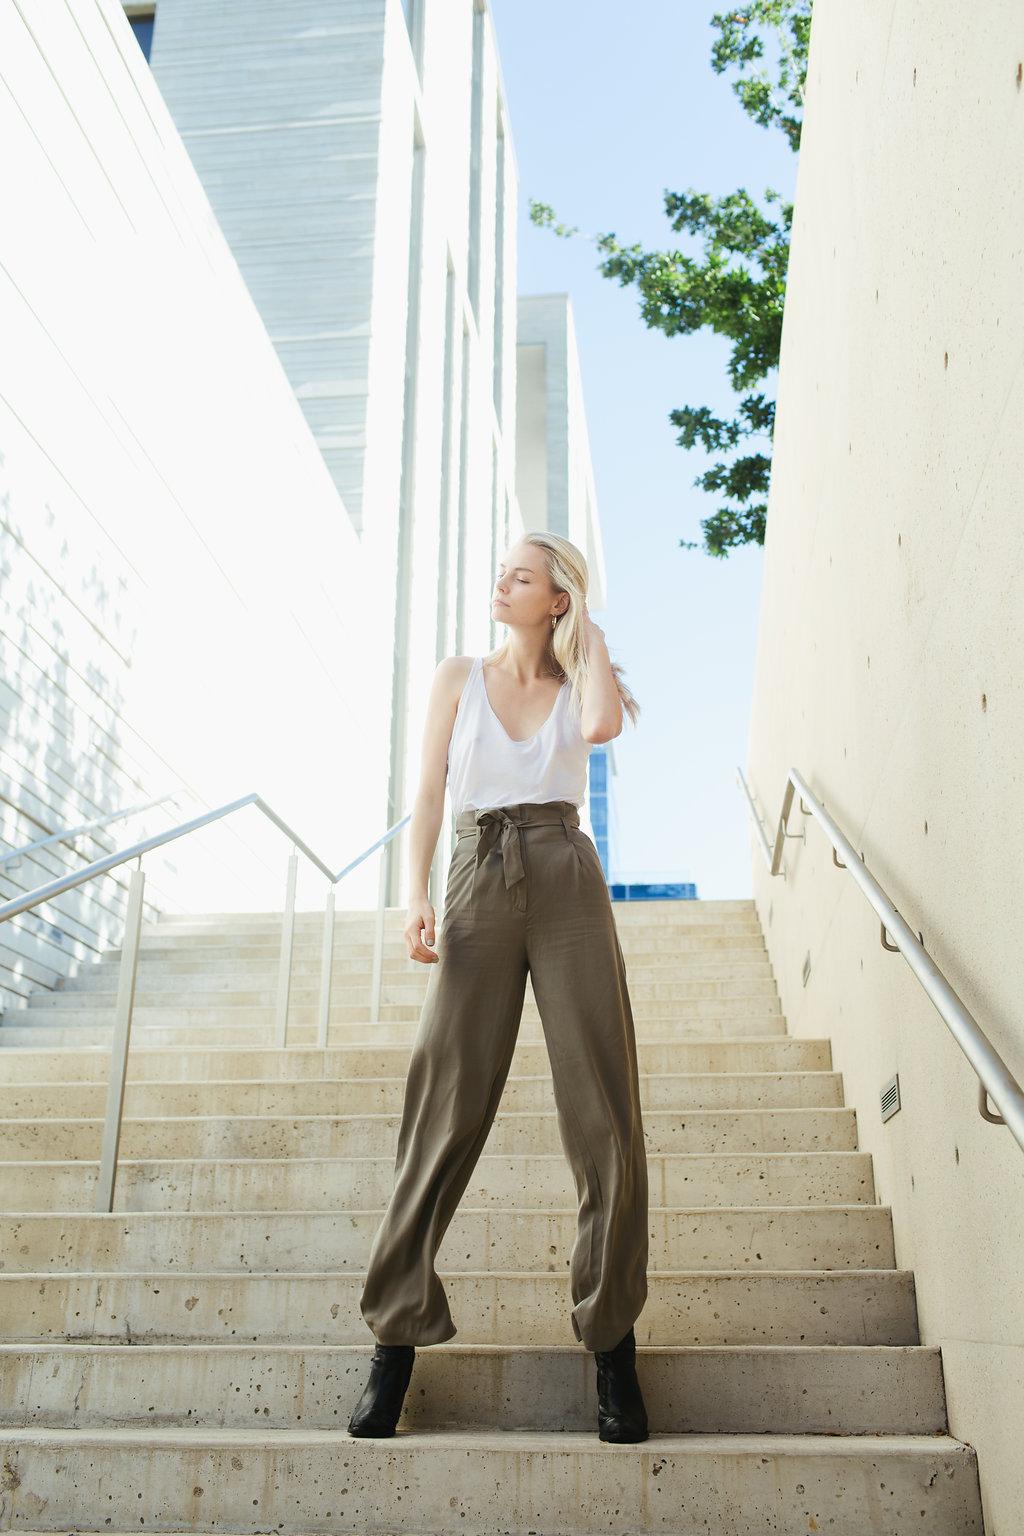 Paige-Newton-Austin-Model-Fashion-Photography0005.jpg